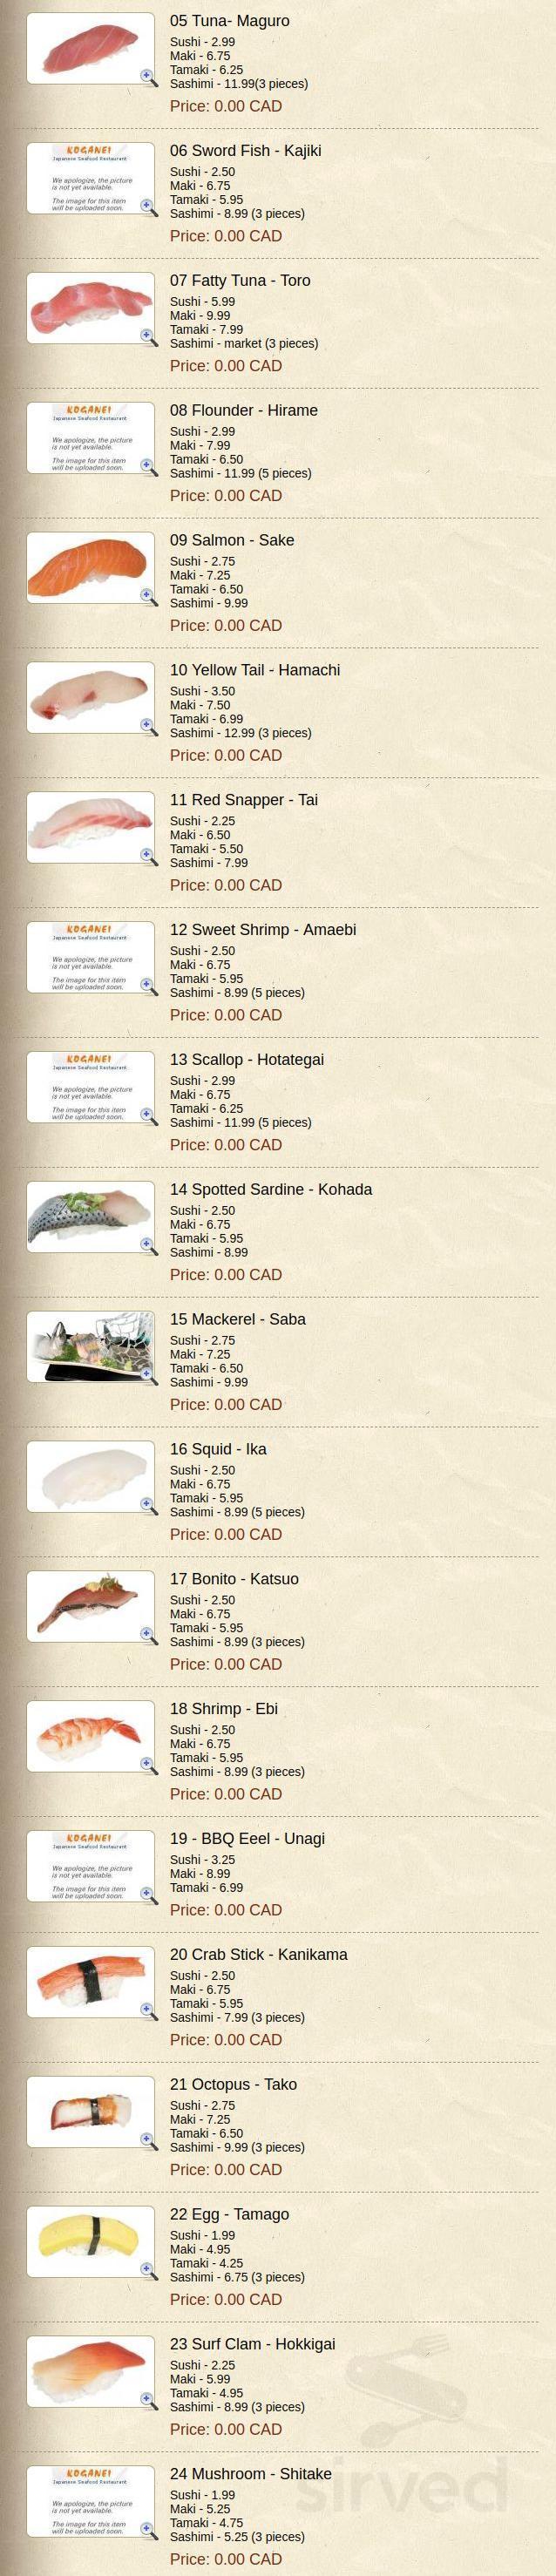 Menu for Koganei Japanese Seafood Restaurant in Woodbridge, Ontario